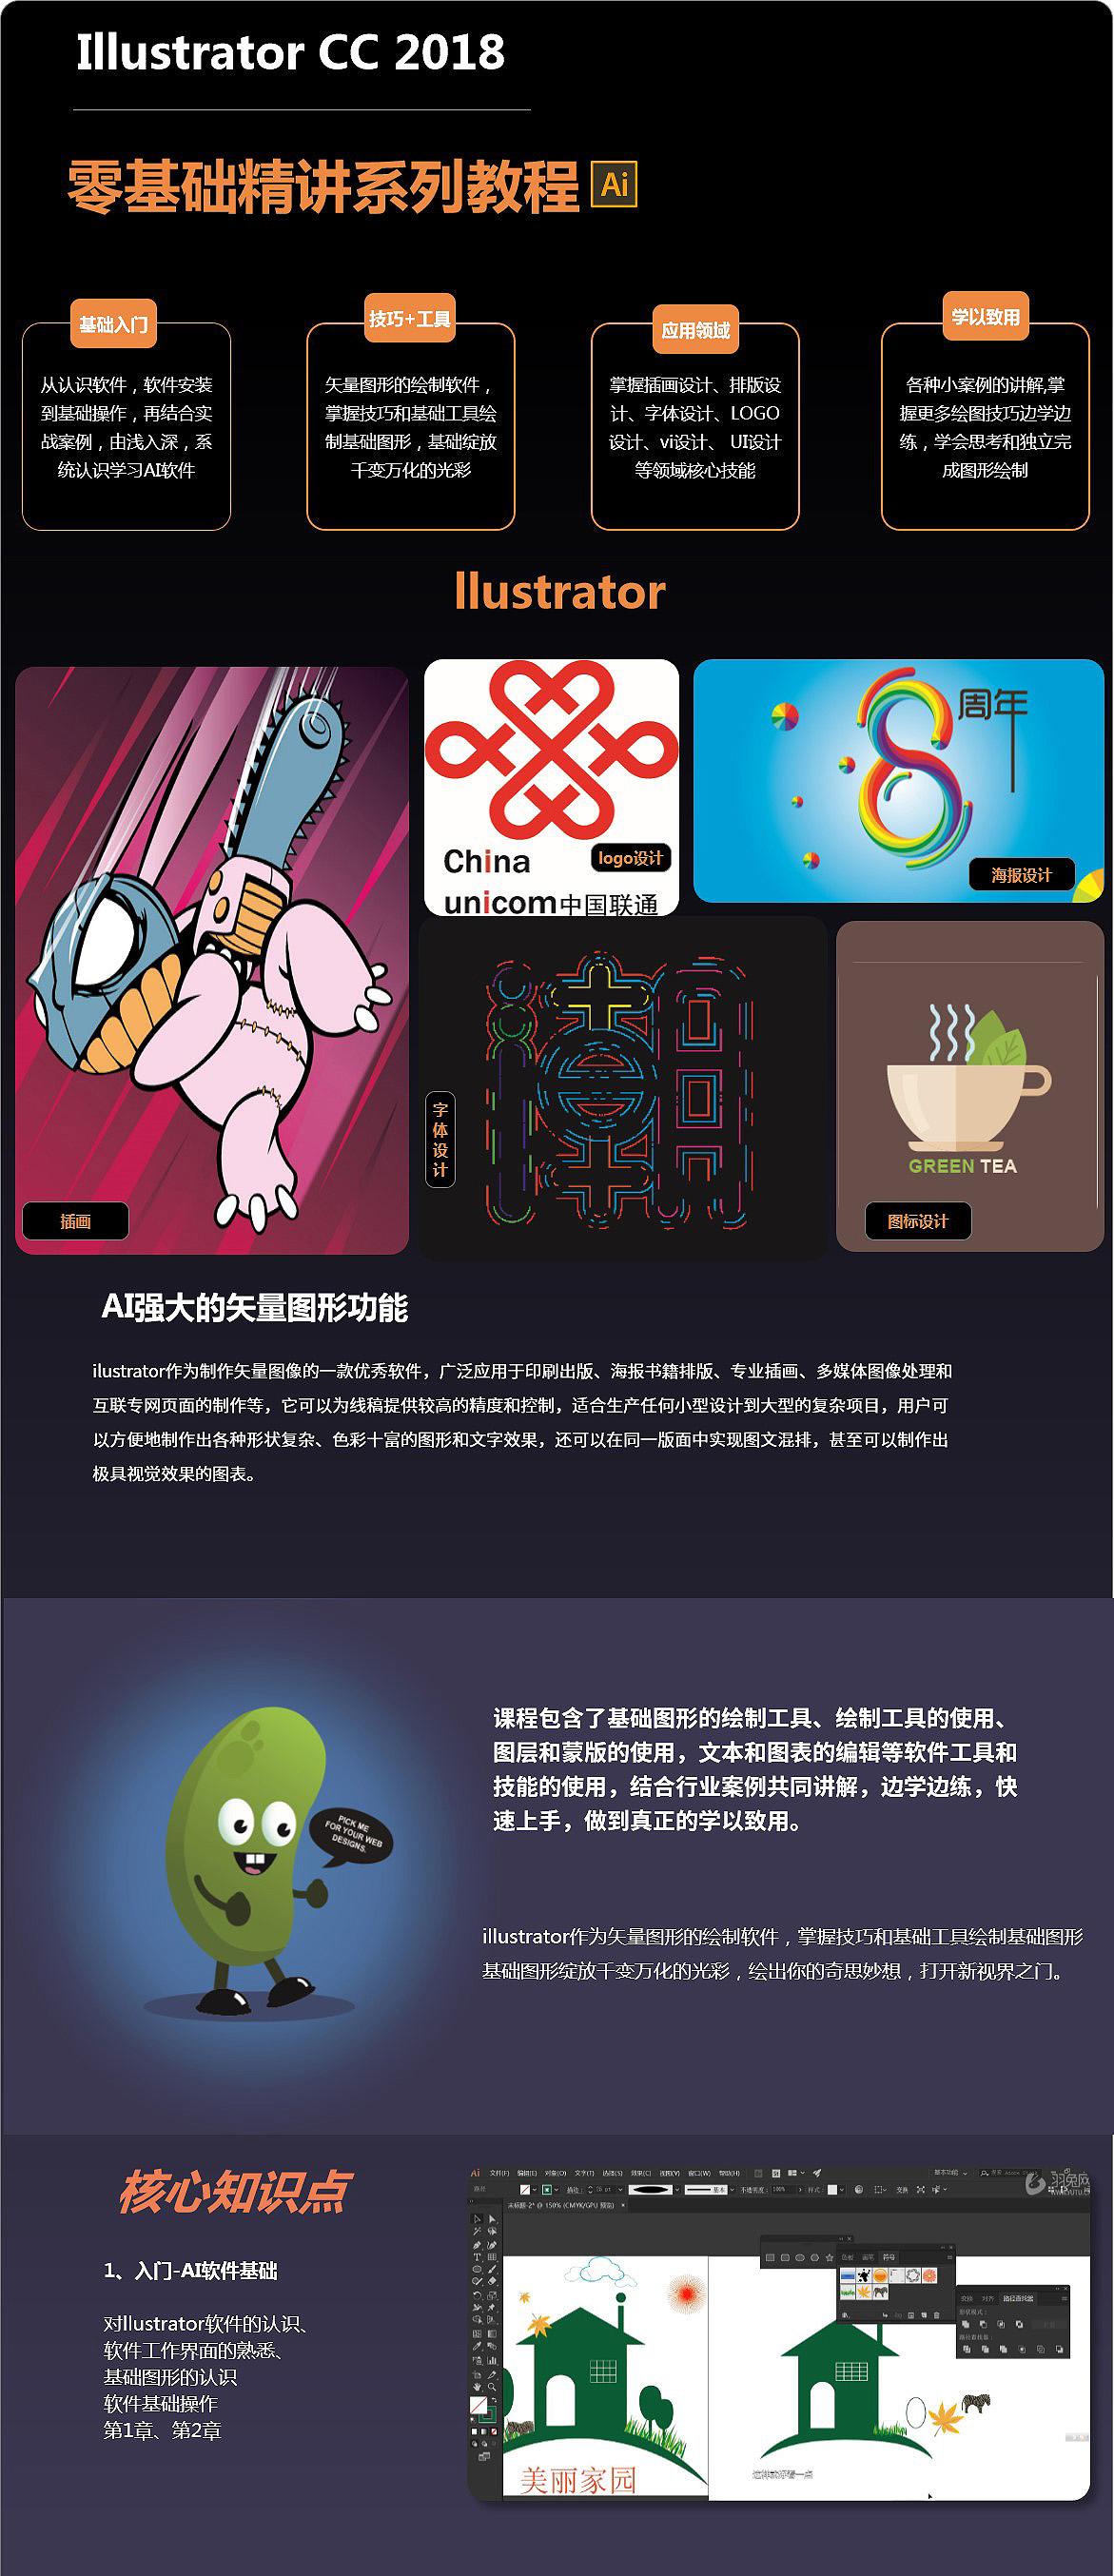 AI-Illustrator CC 2018精讲系列教程